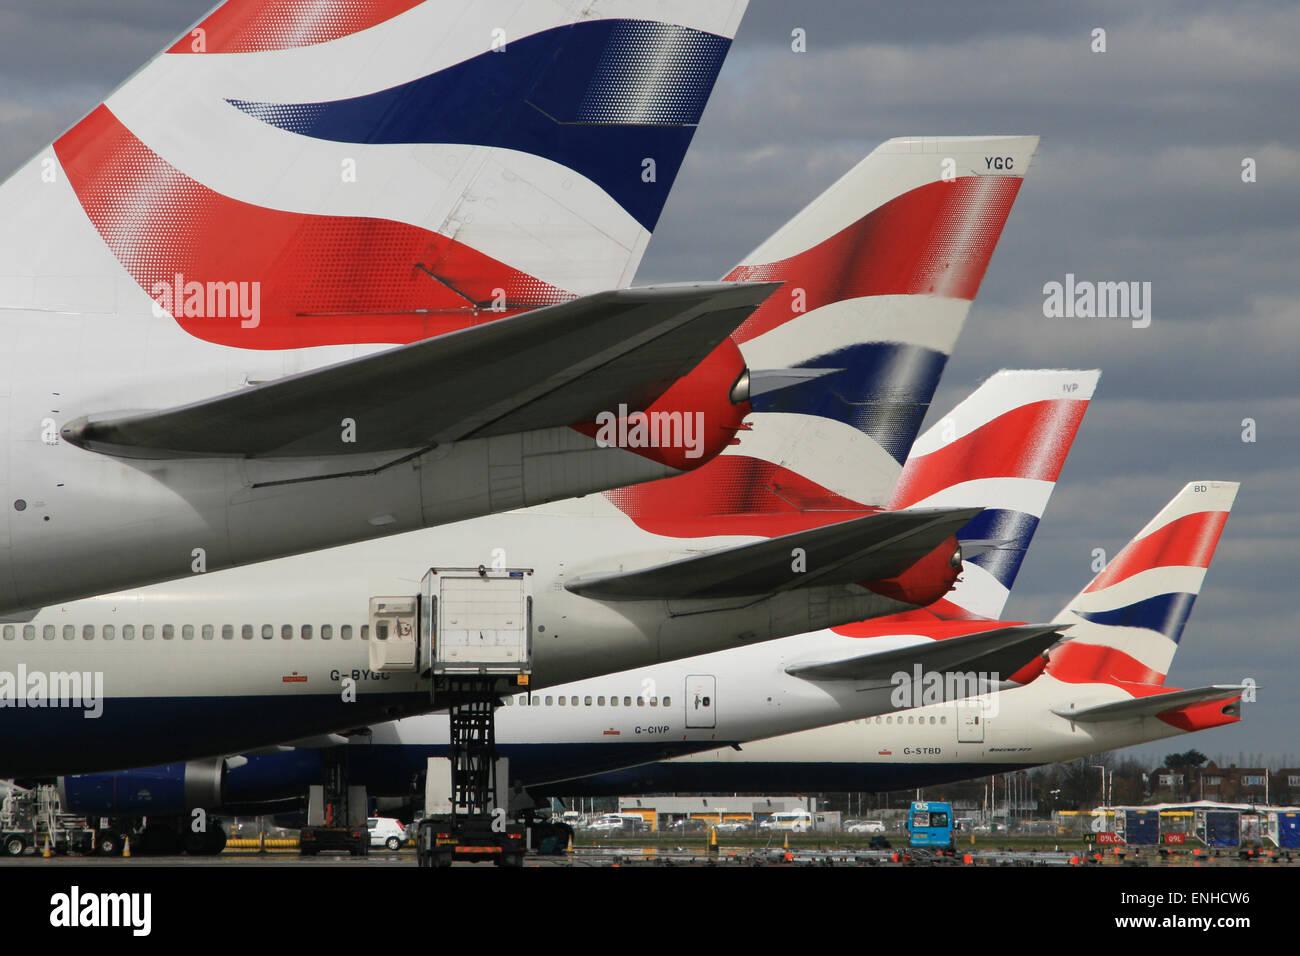 BRITISH AIRWAYS HEATHROW AIRPORT - Stock Image